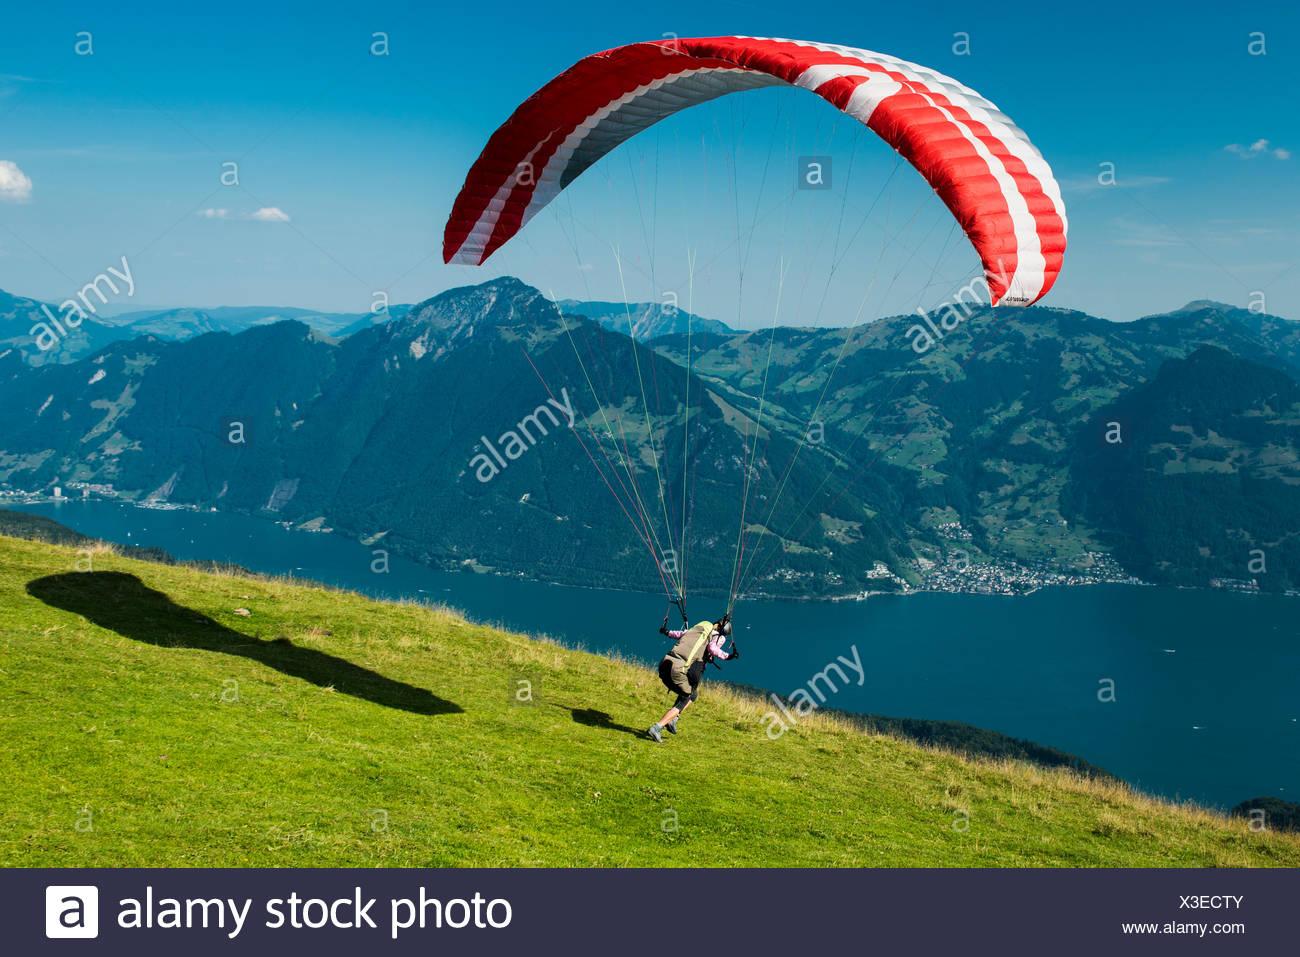 Paraglider Starting Stock Photos & Paraglider Starting Stock Images